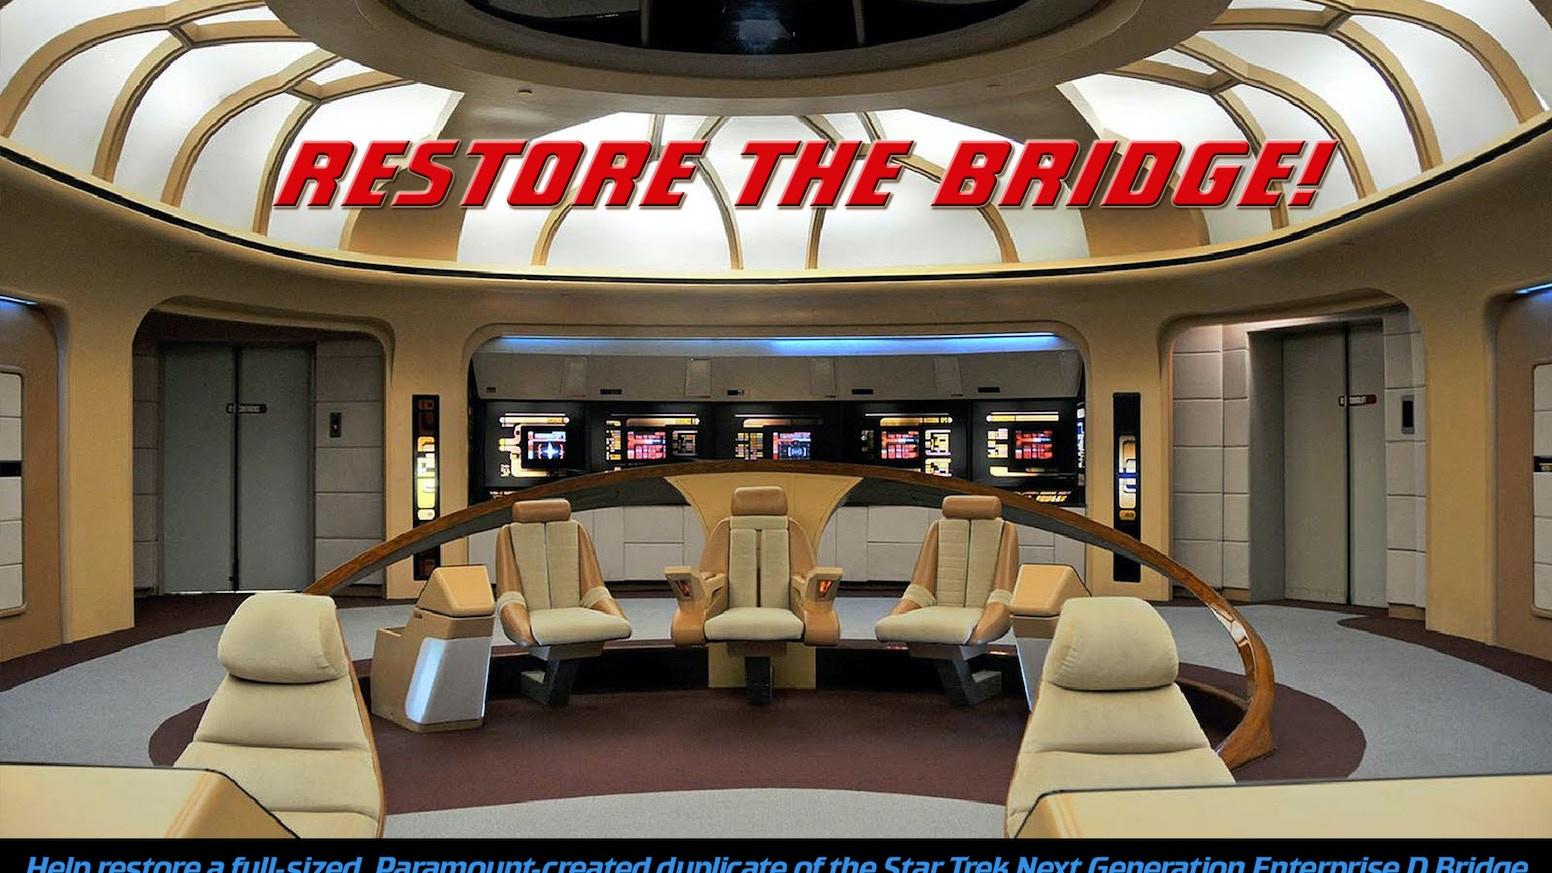 Star Trek Enterprise BRIDGE INTERACTIVE MUSEUM by New Starship